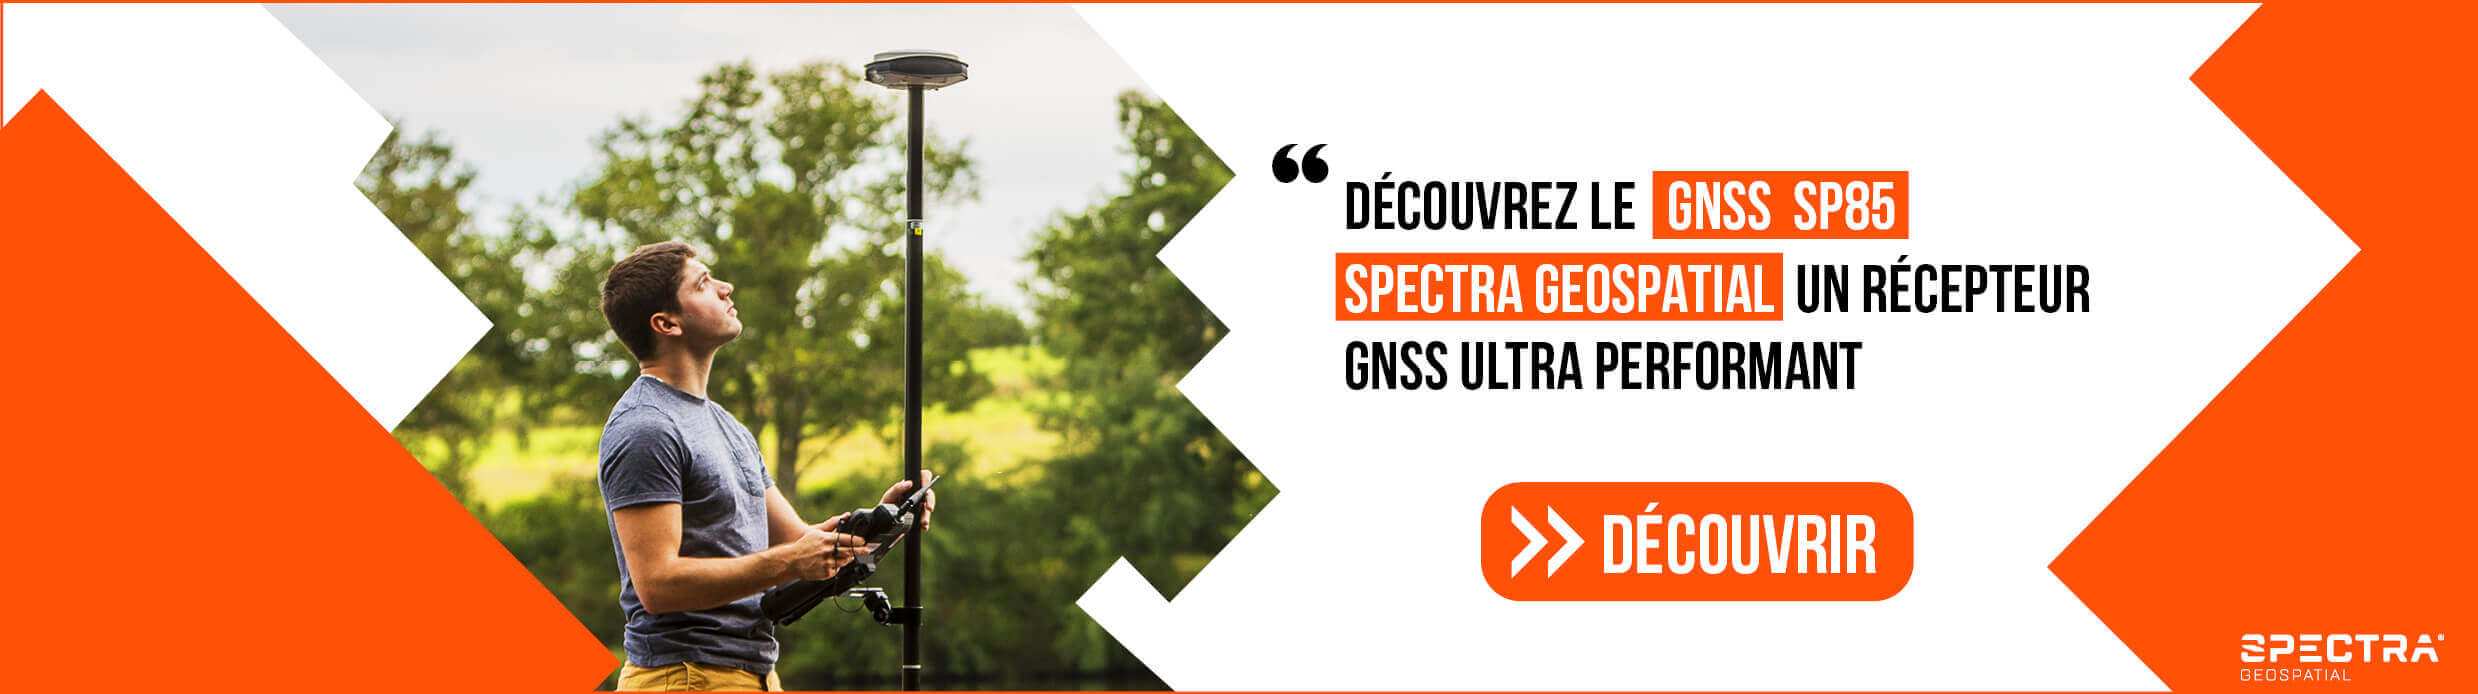 Récepteur GNSS SP85 Spectra